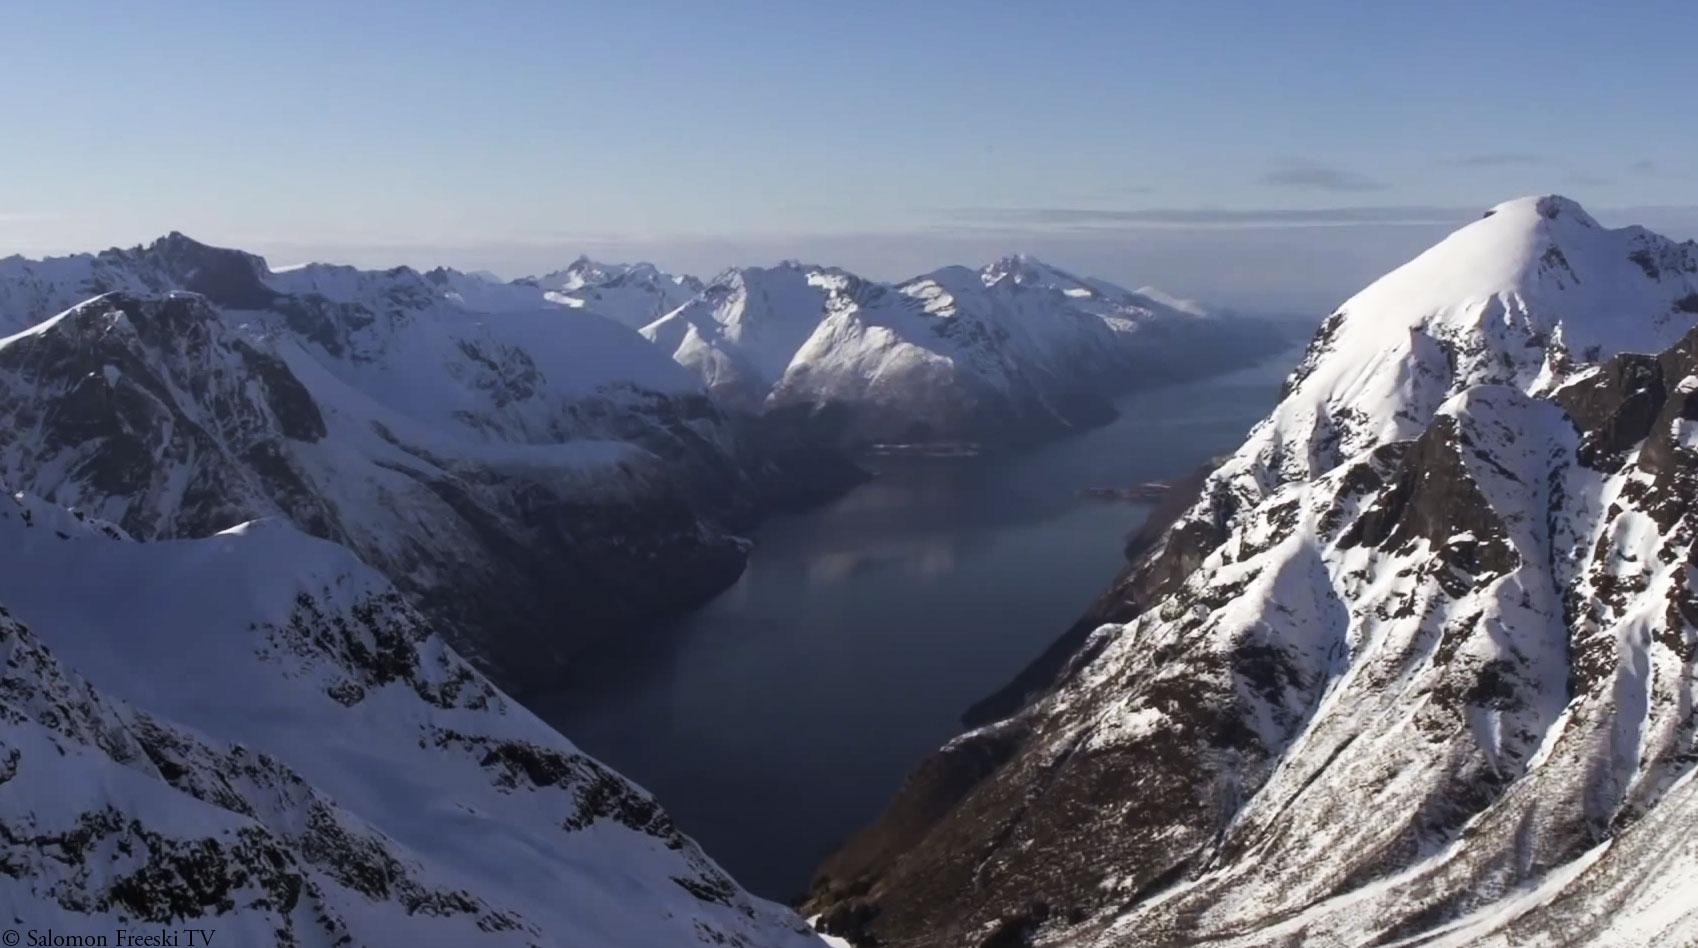 Fjord Salomon Freeski TV